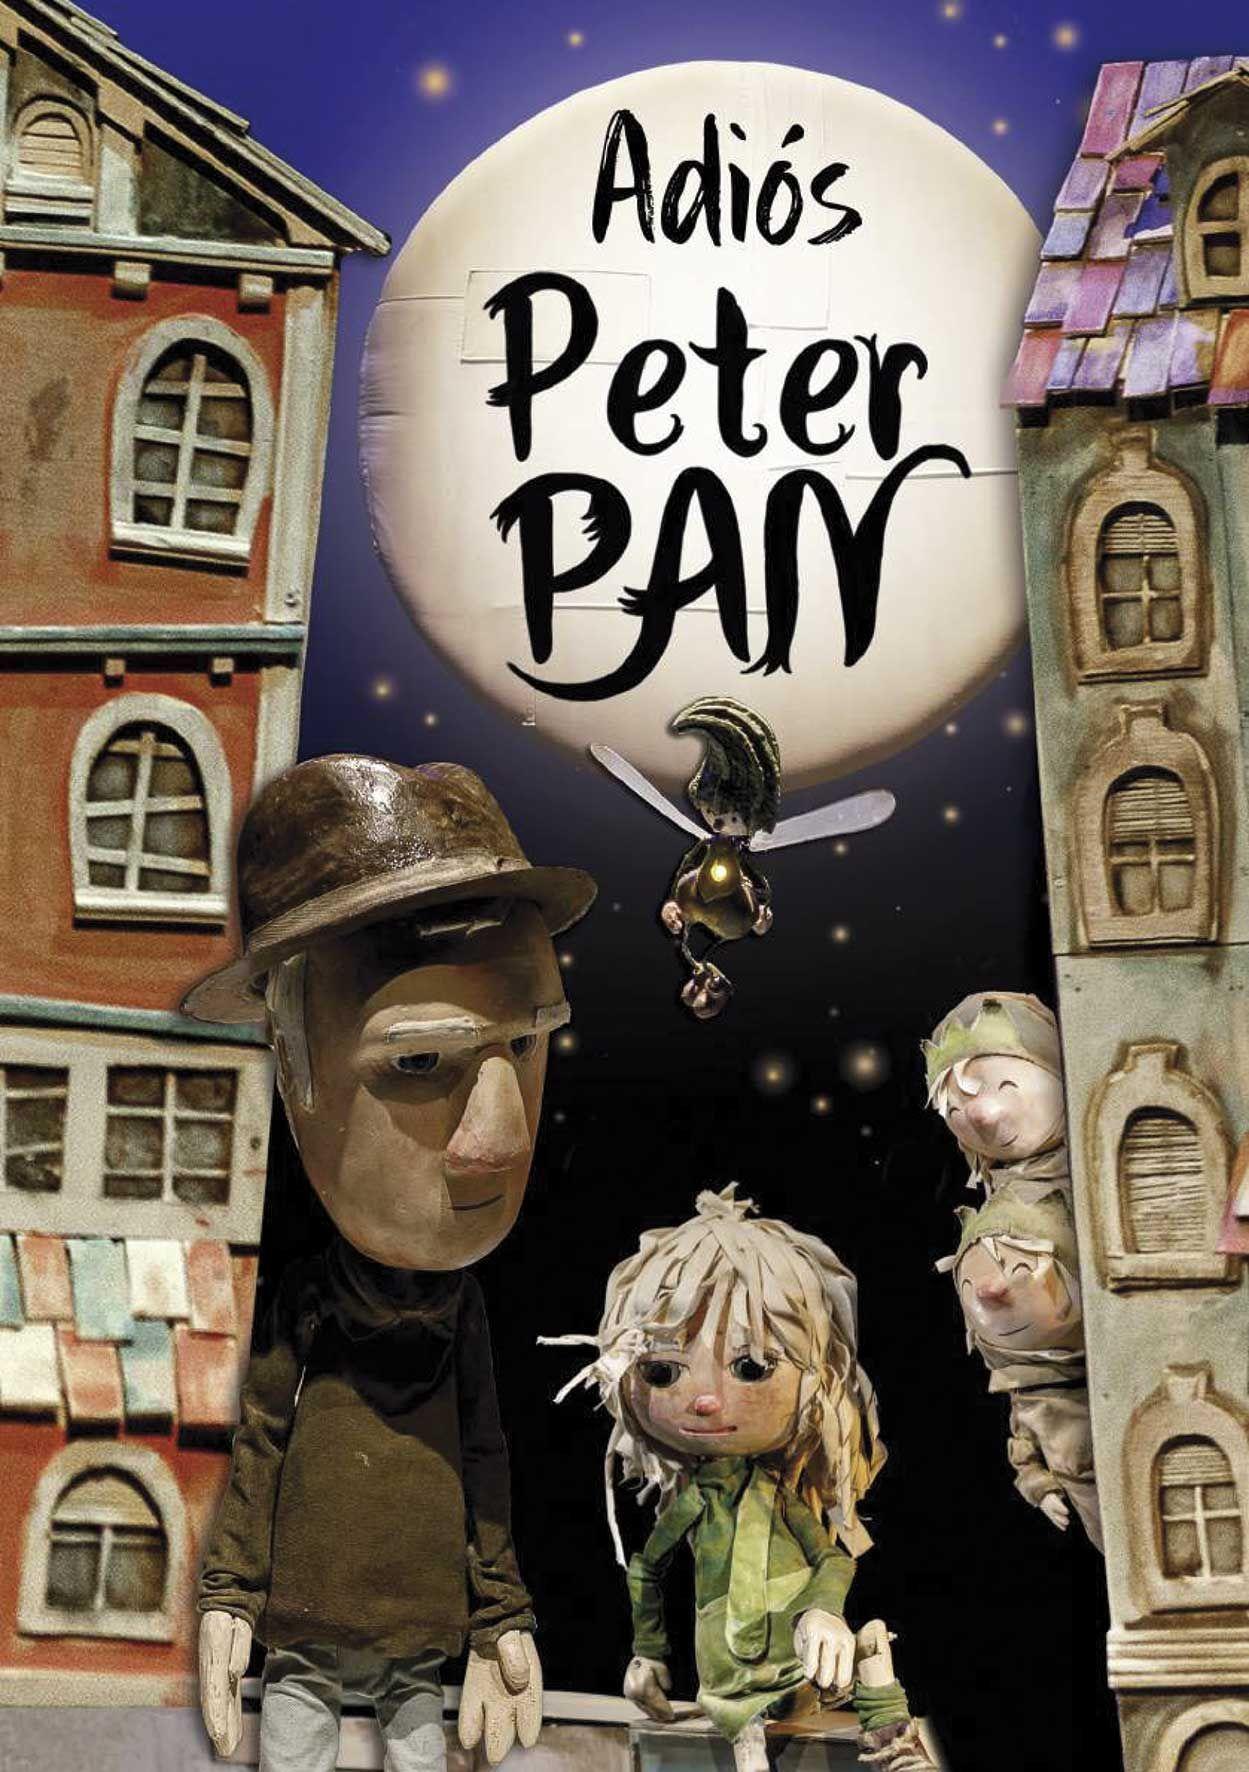 Adios Peter Pan